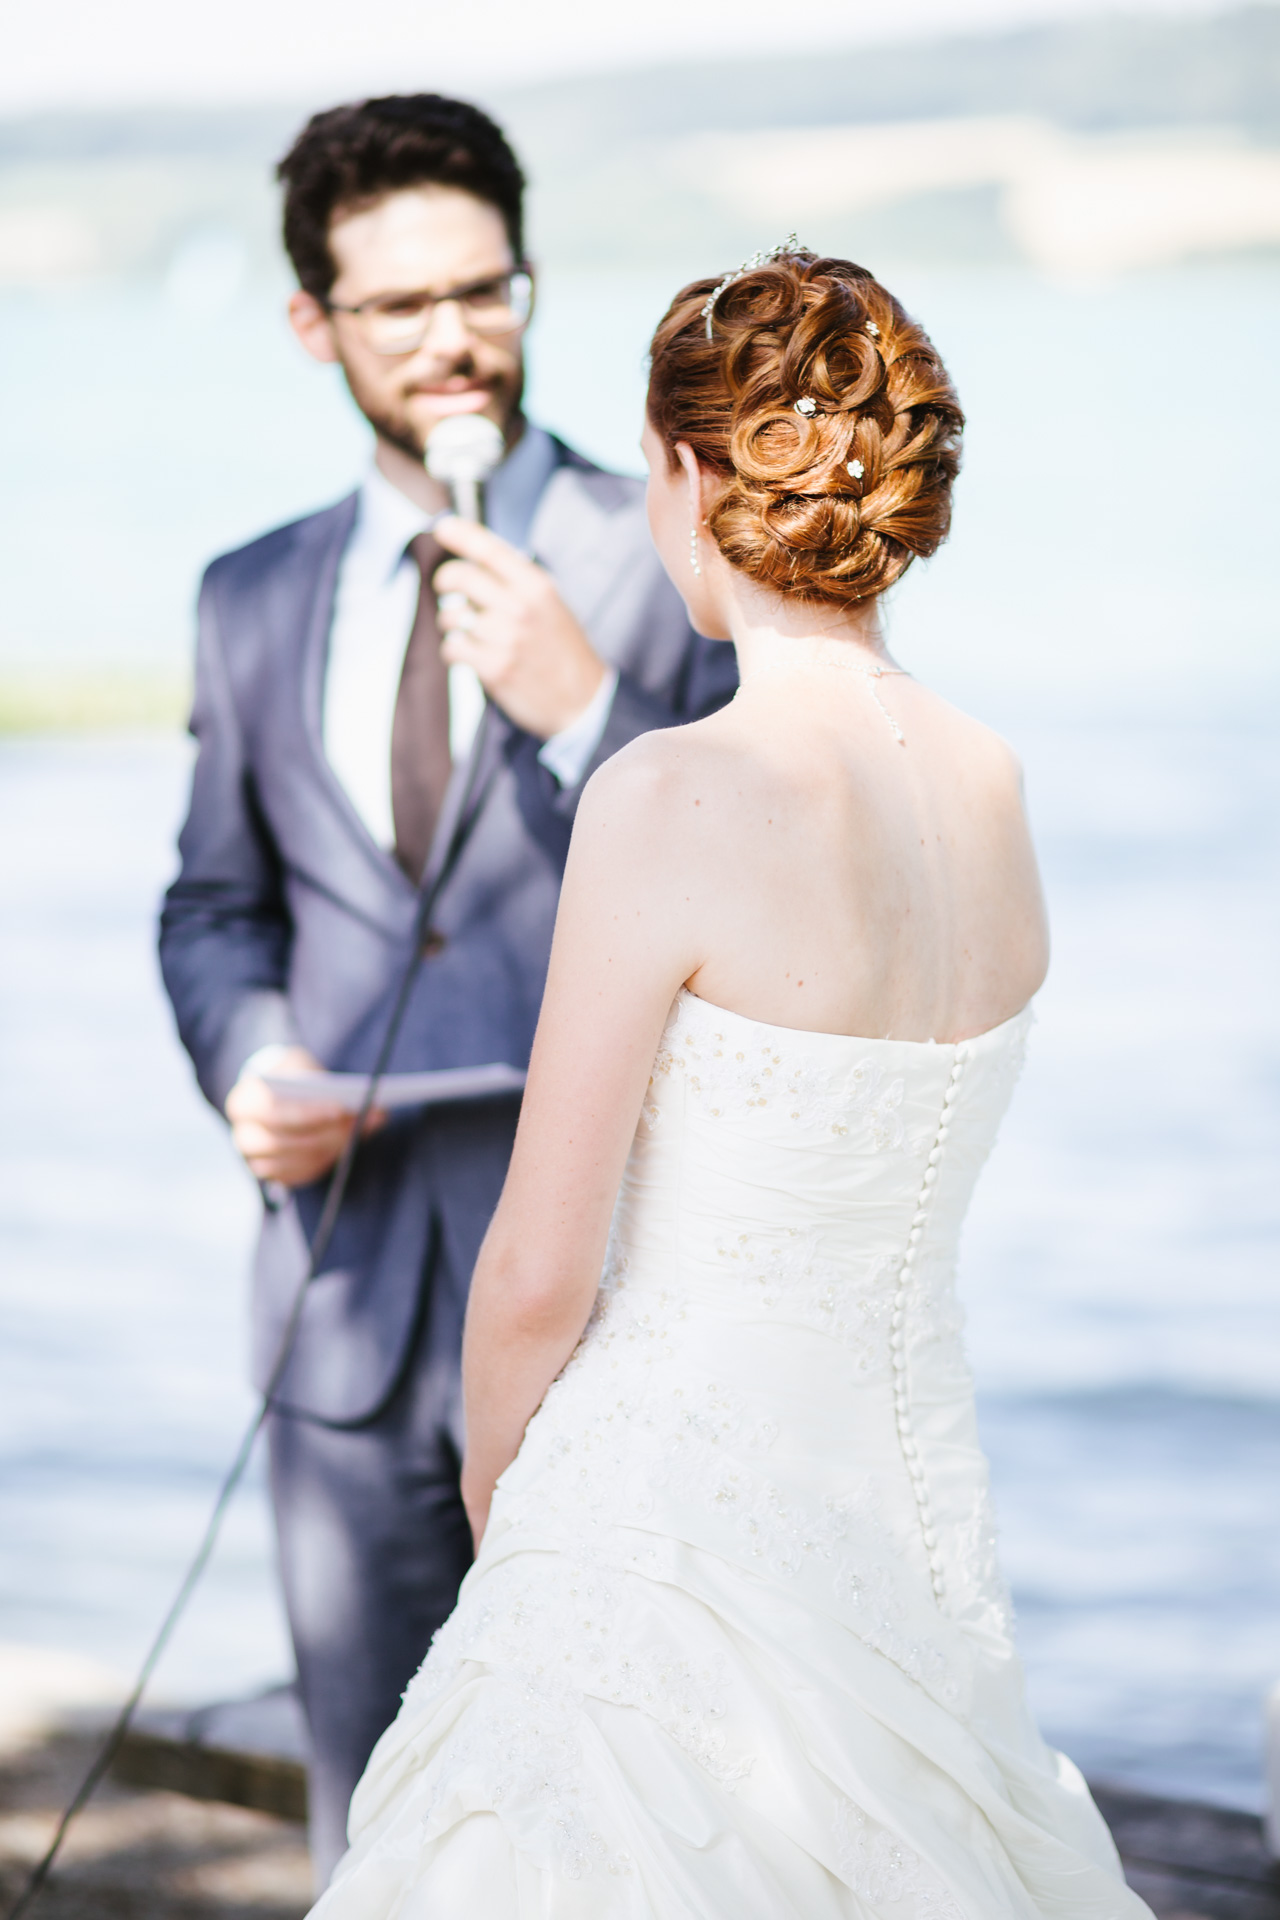 Pixelart_Hochzeitsfotografen_Loerrach_Rheinfelden_Hallwil_Schweiz_Linda-Ramon-1037